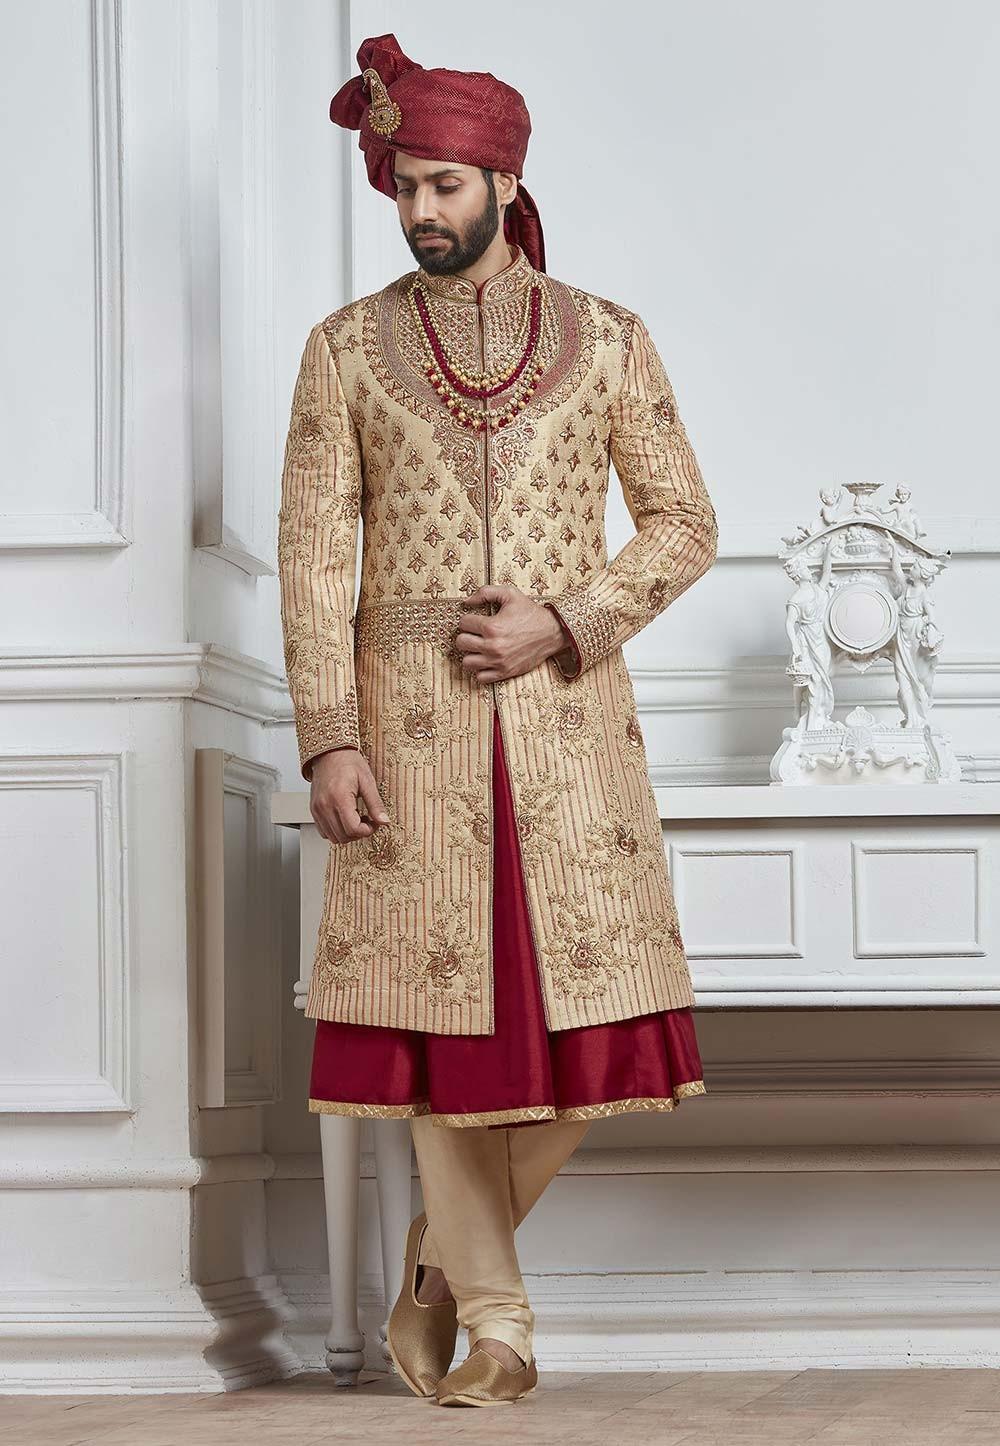 Buy Golden,Maroon Color Wedding Sherwani for men